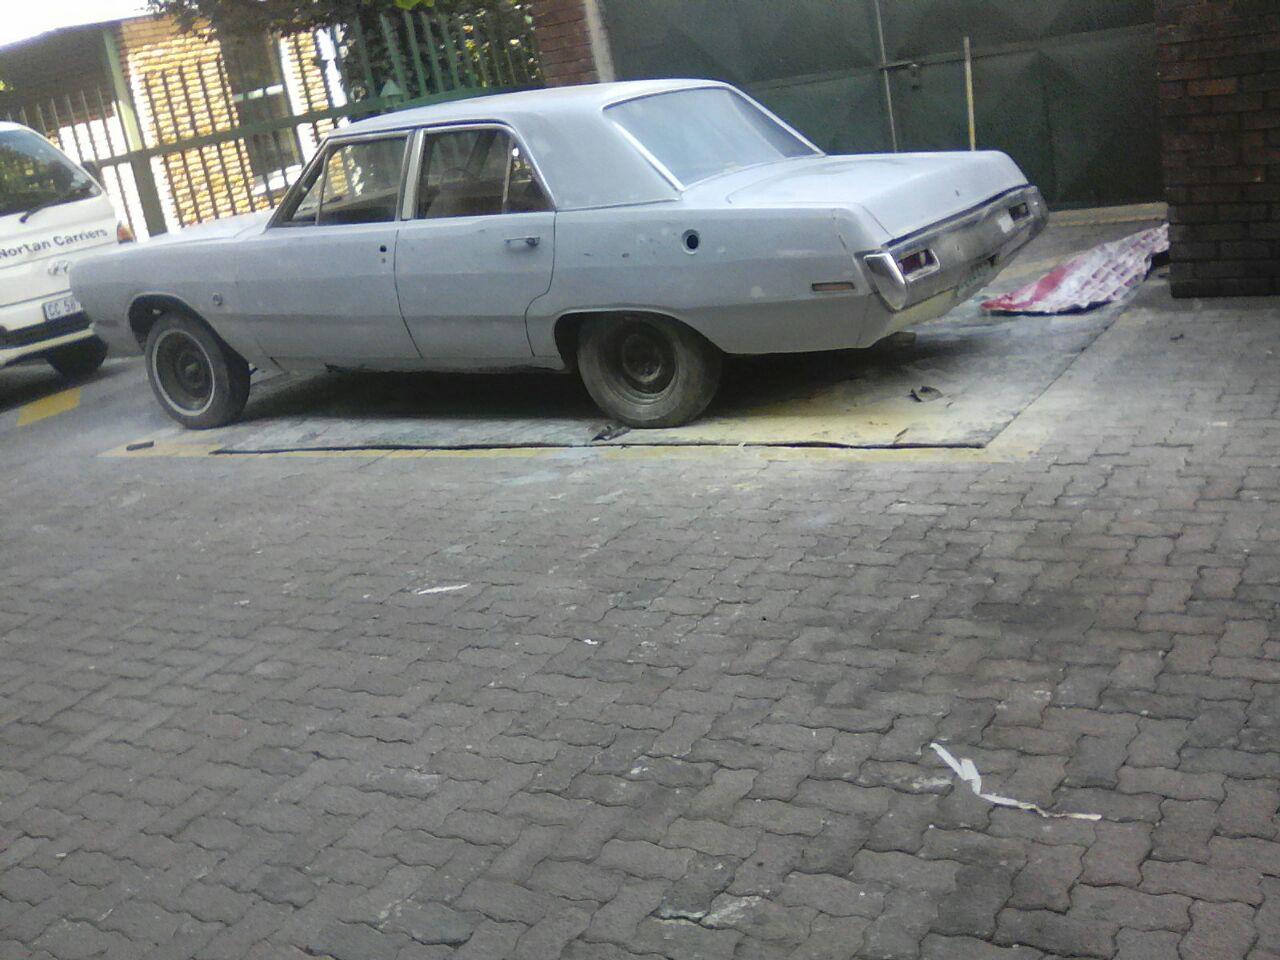 Valiant Regal 1970 for restoration